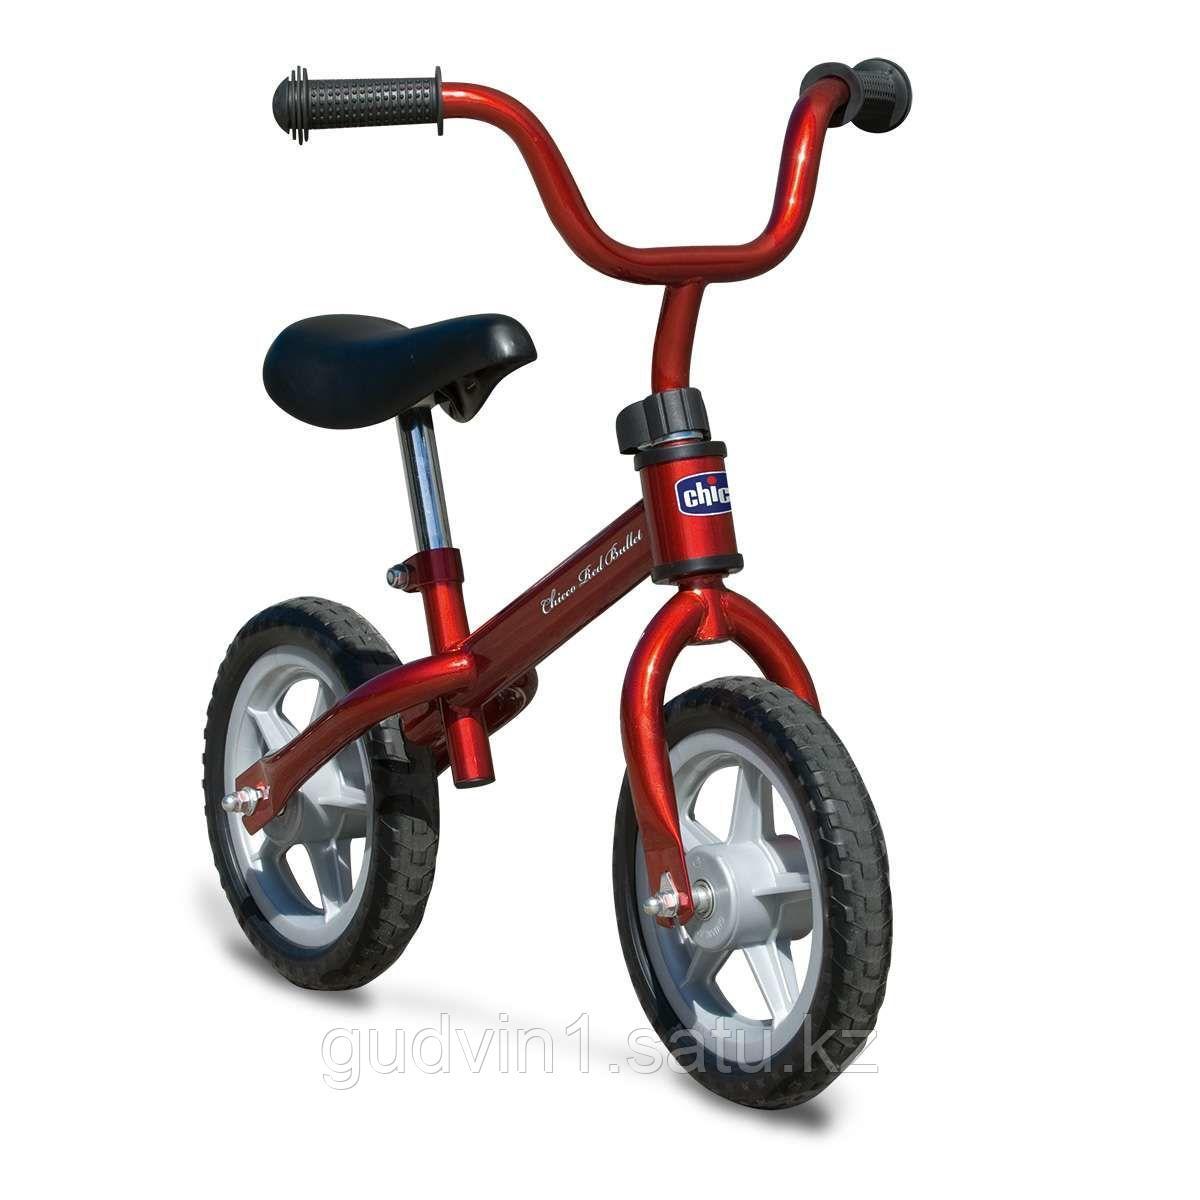 "Chicco: Беговел Balance bike ""Первый Байк"" 1165785"